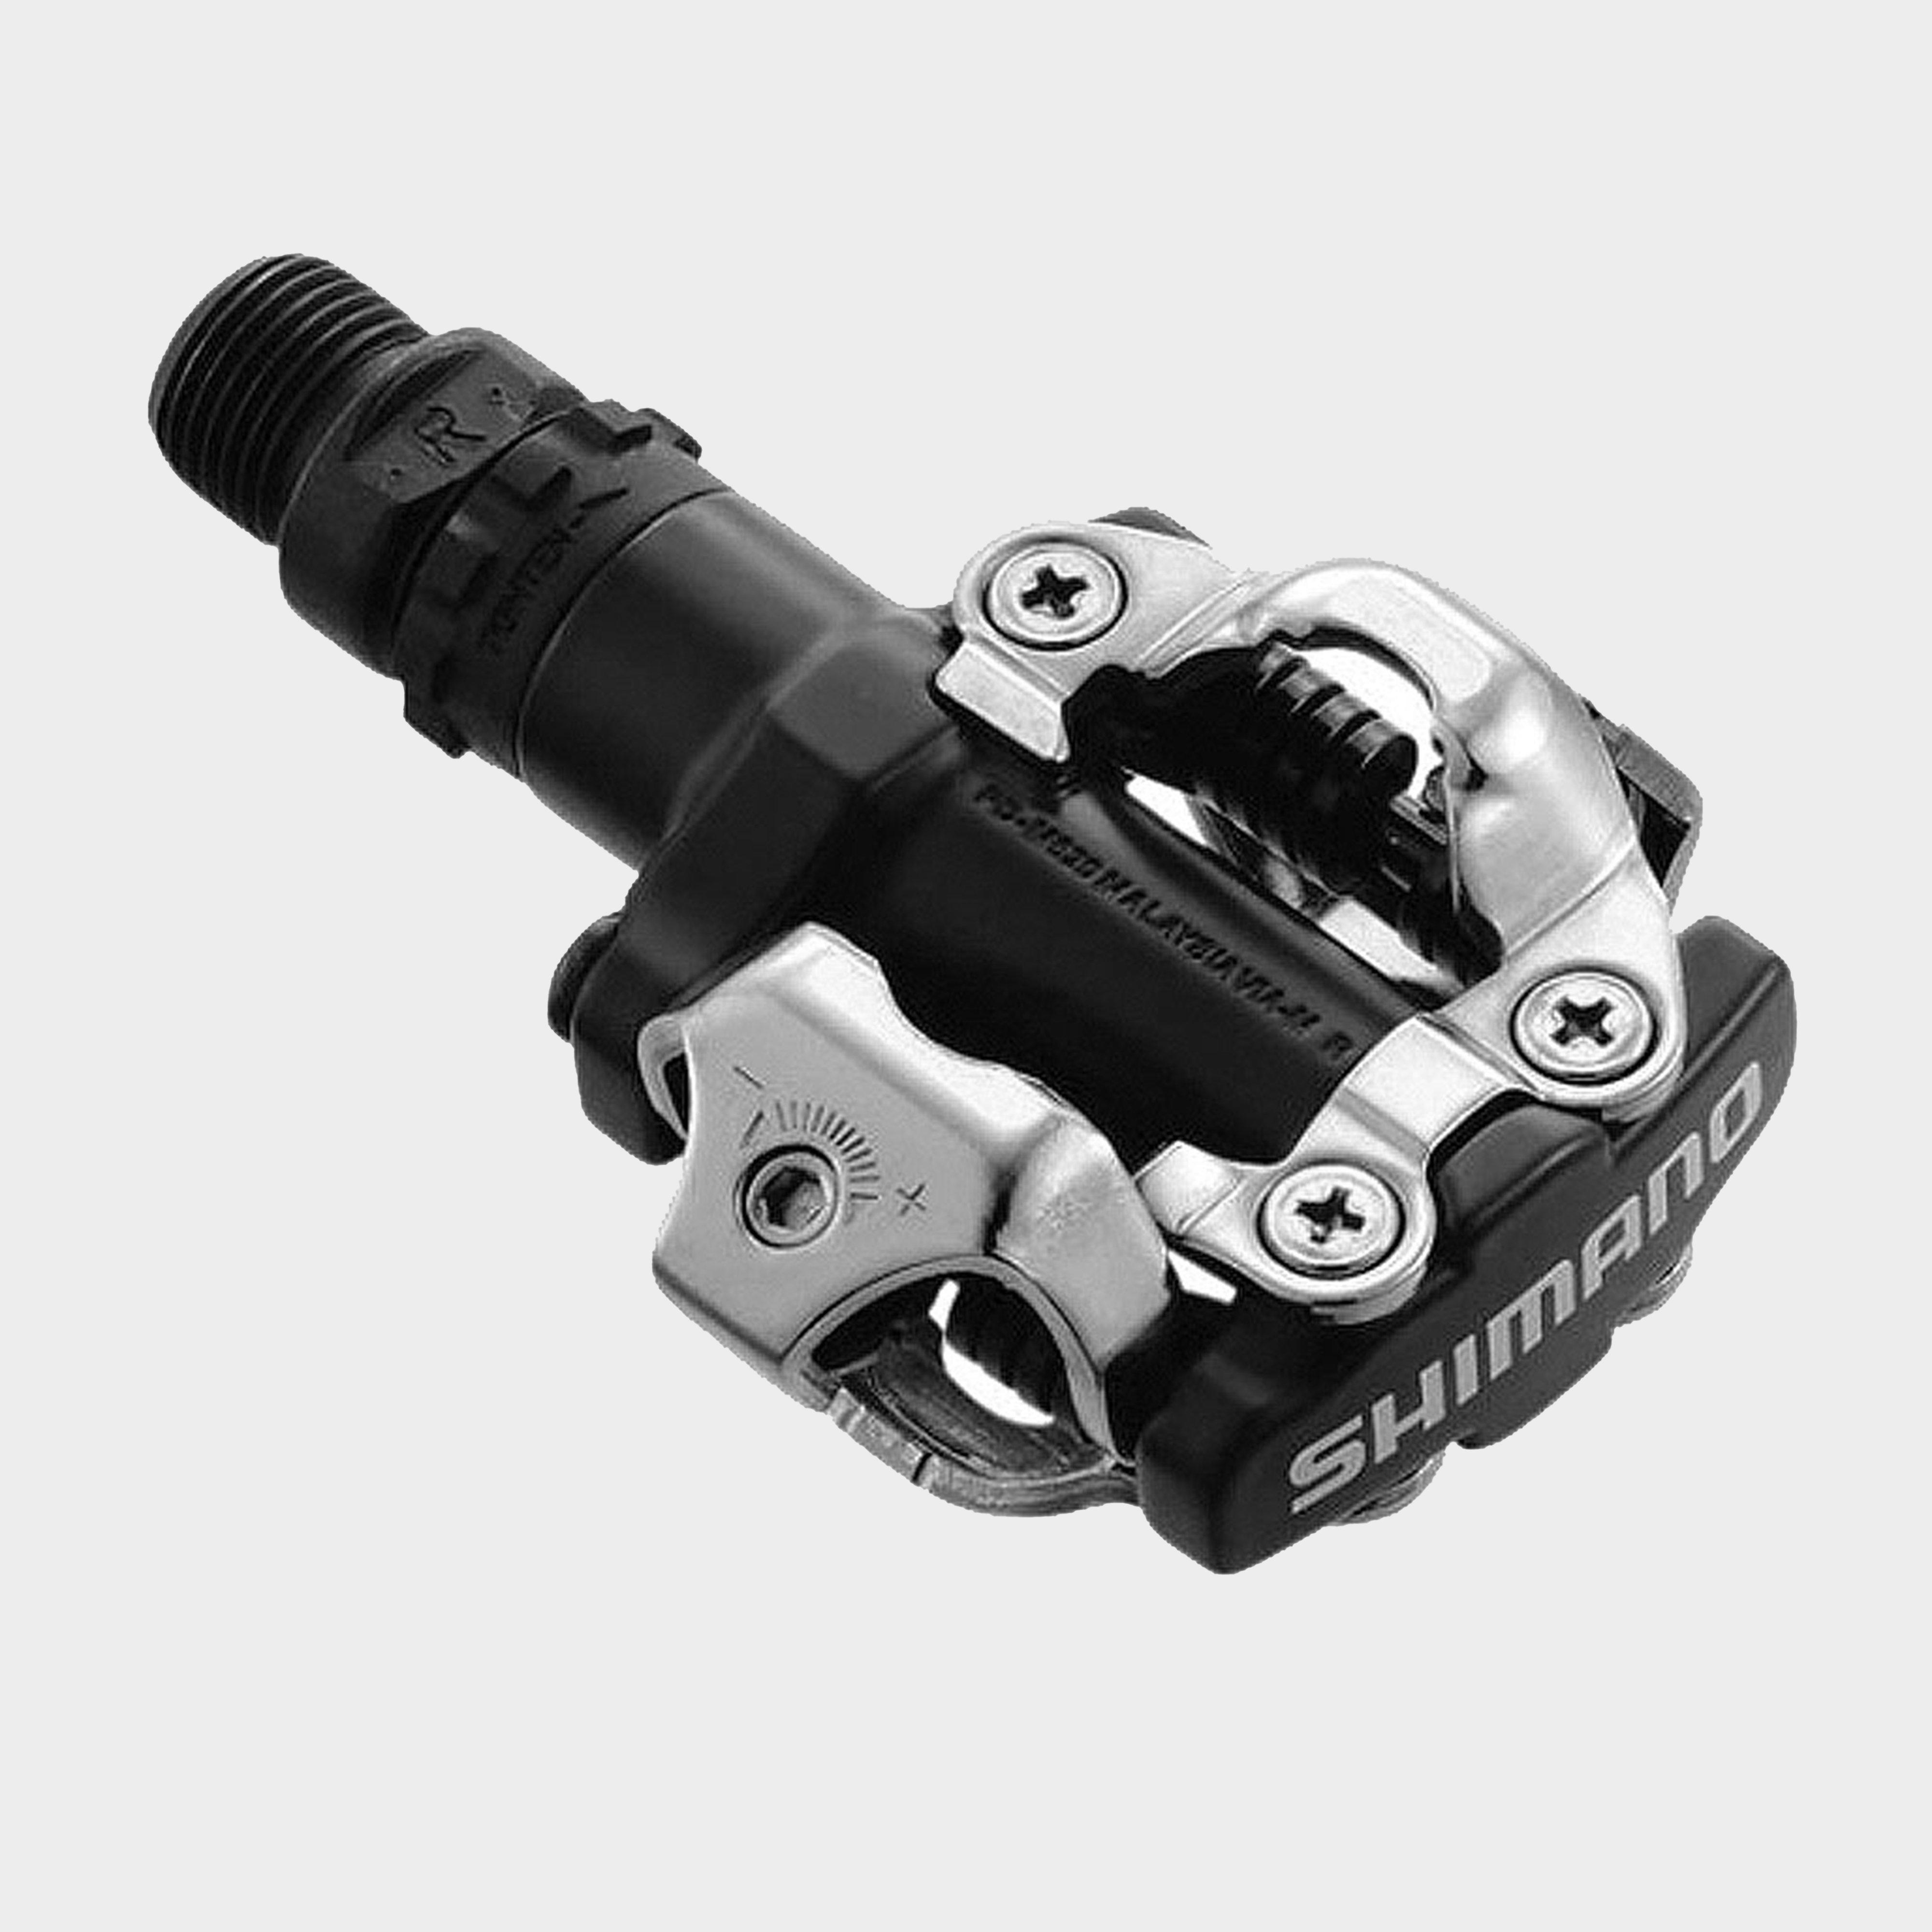 Bontrager M520 Mountain Bike Spd Pedals - Black/blk  Black/blk